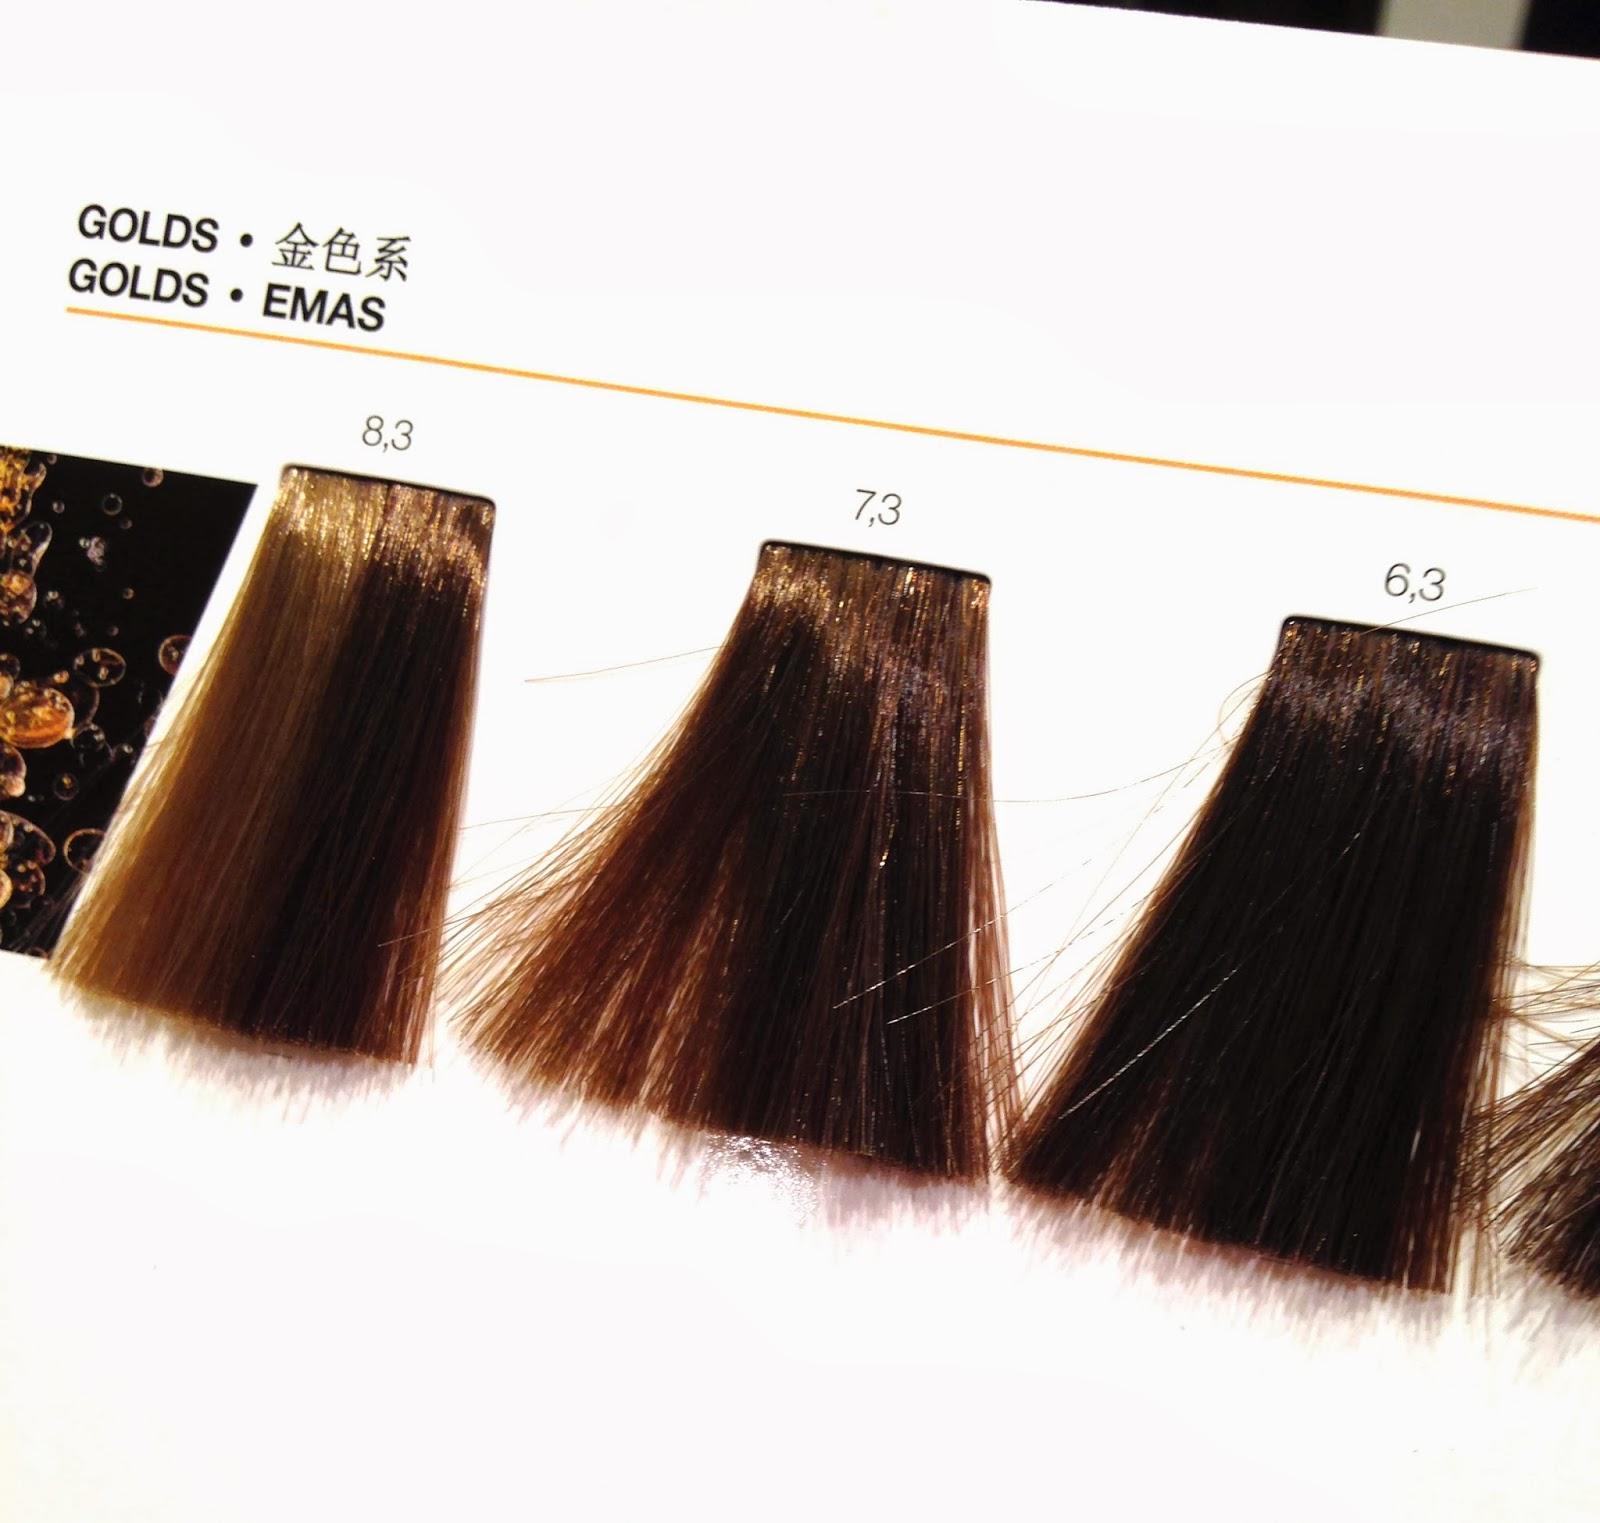 Inoa hair color chart uk best hair color 2017 inoa hair colour chart uk best color 2017 nvjuhfo Images